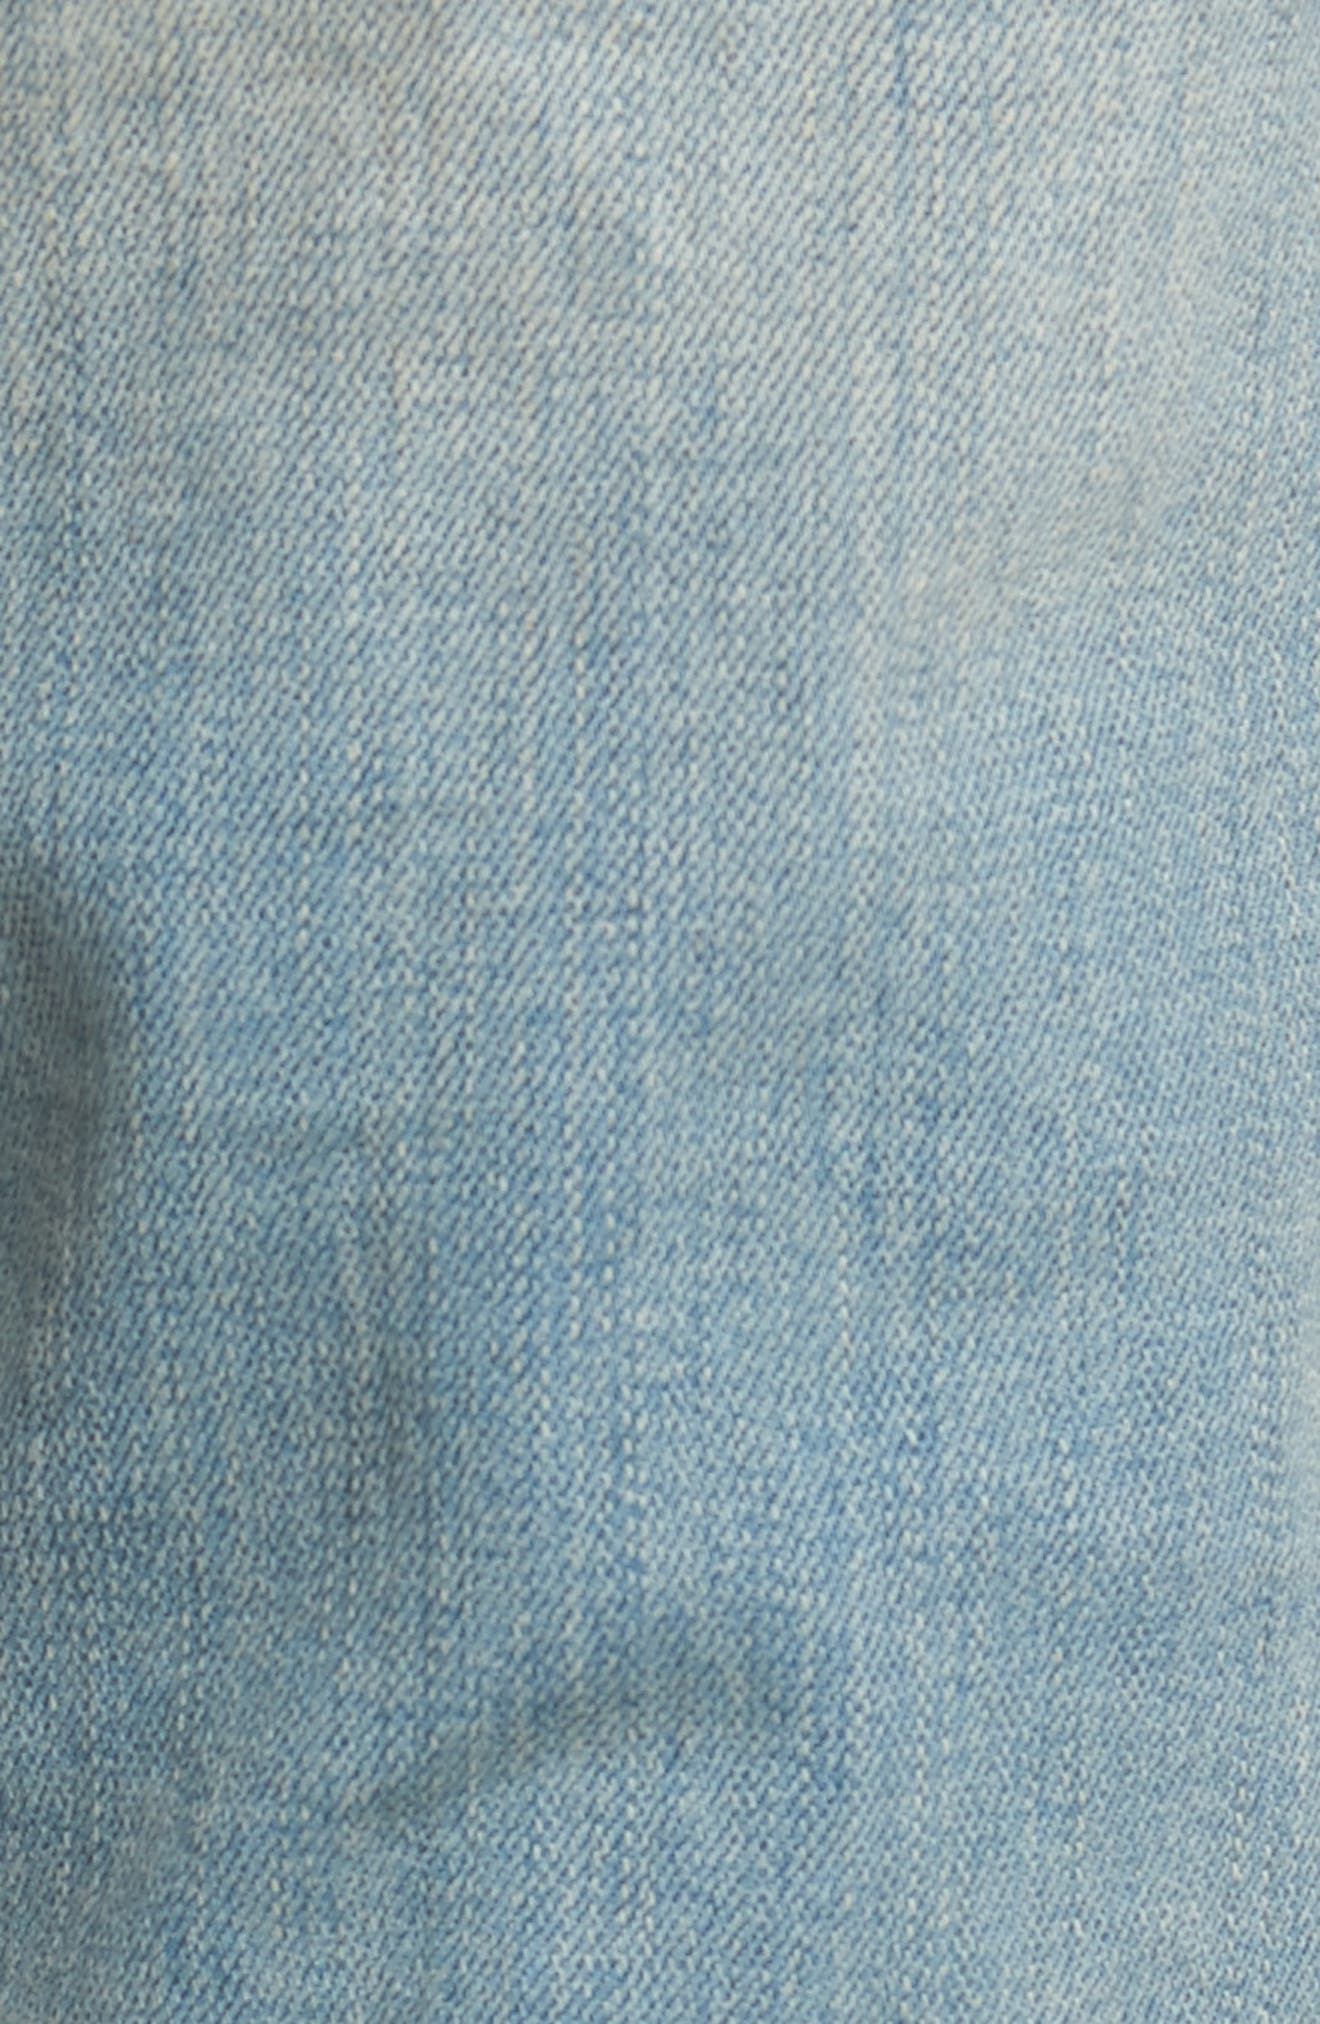 Slim Fit Distressed Jeans,                             Alternate thumbnail 10, color,